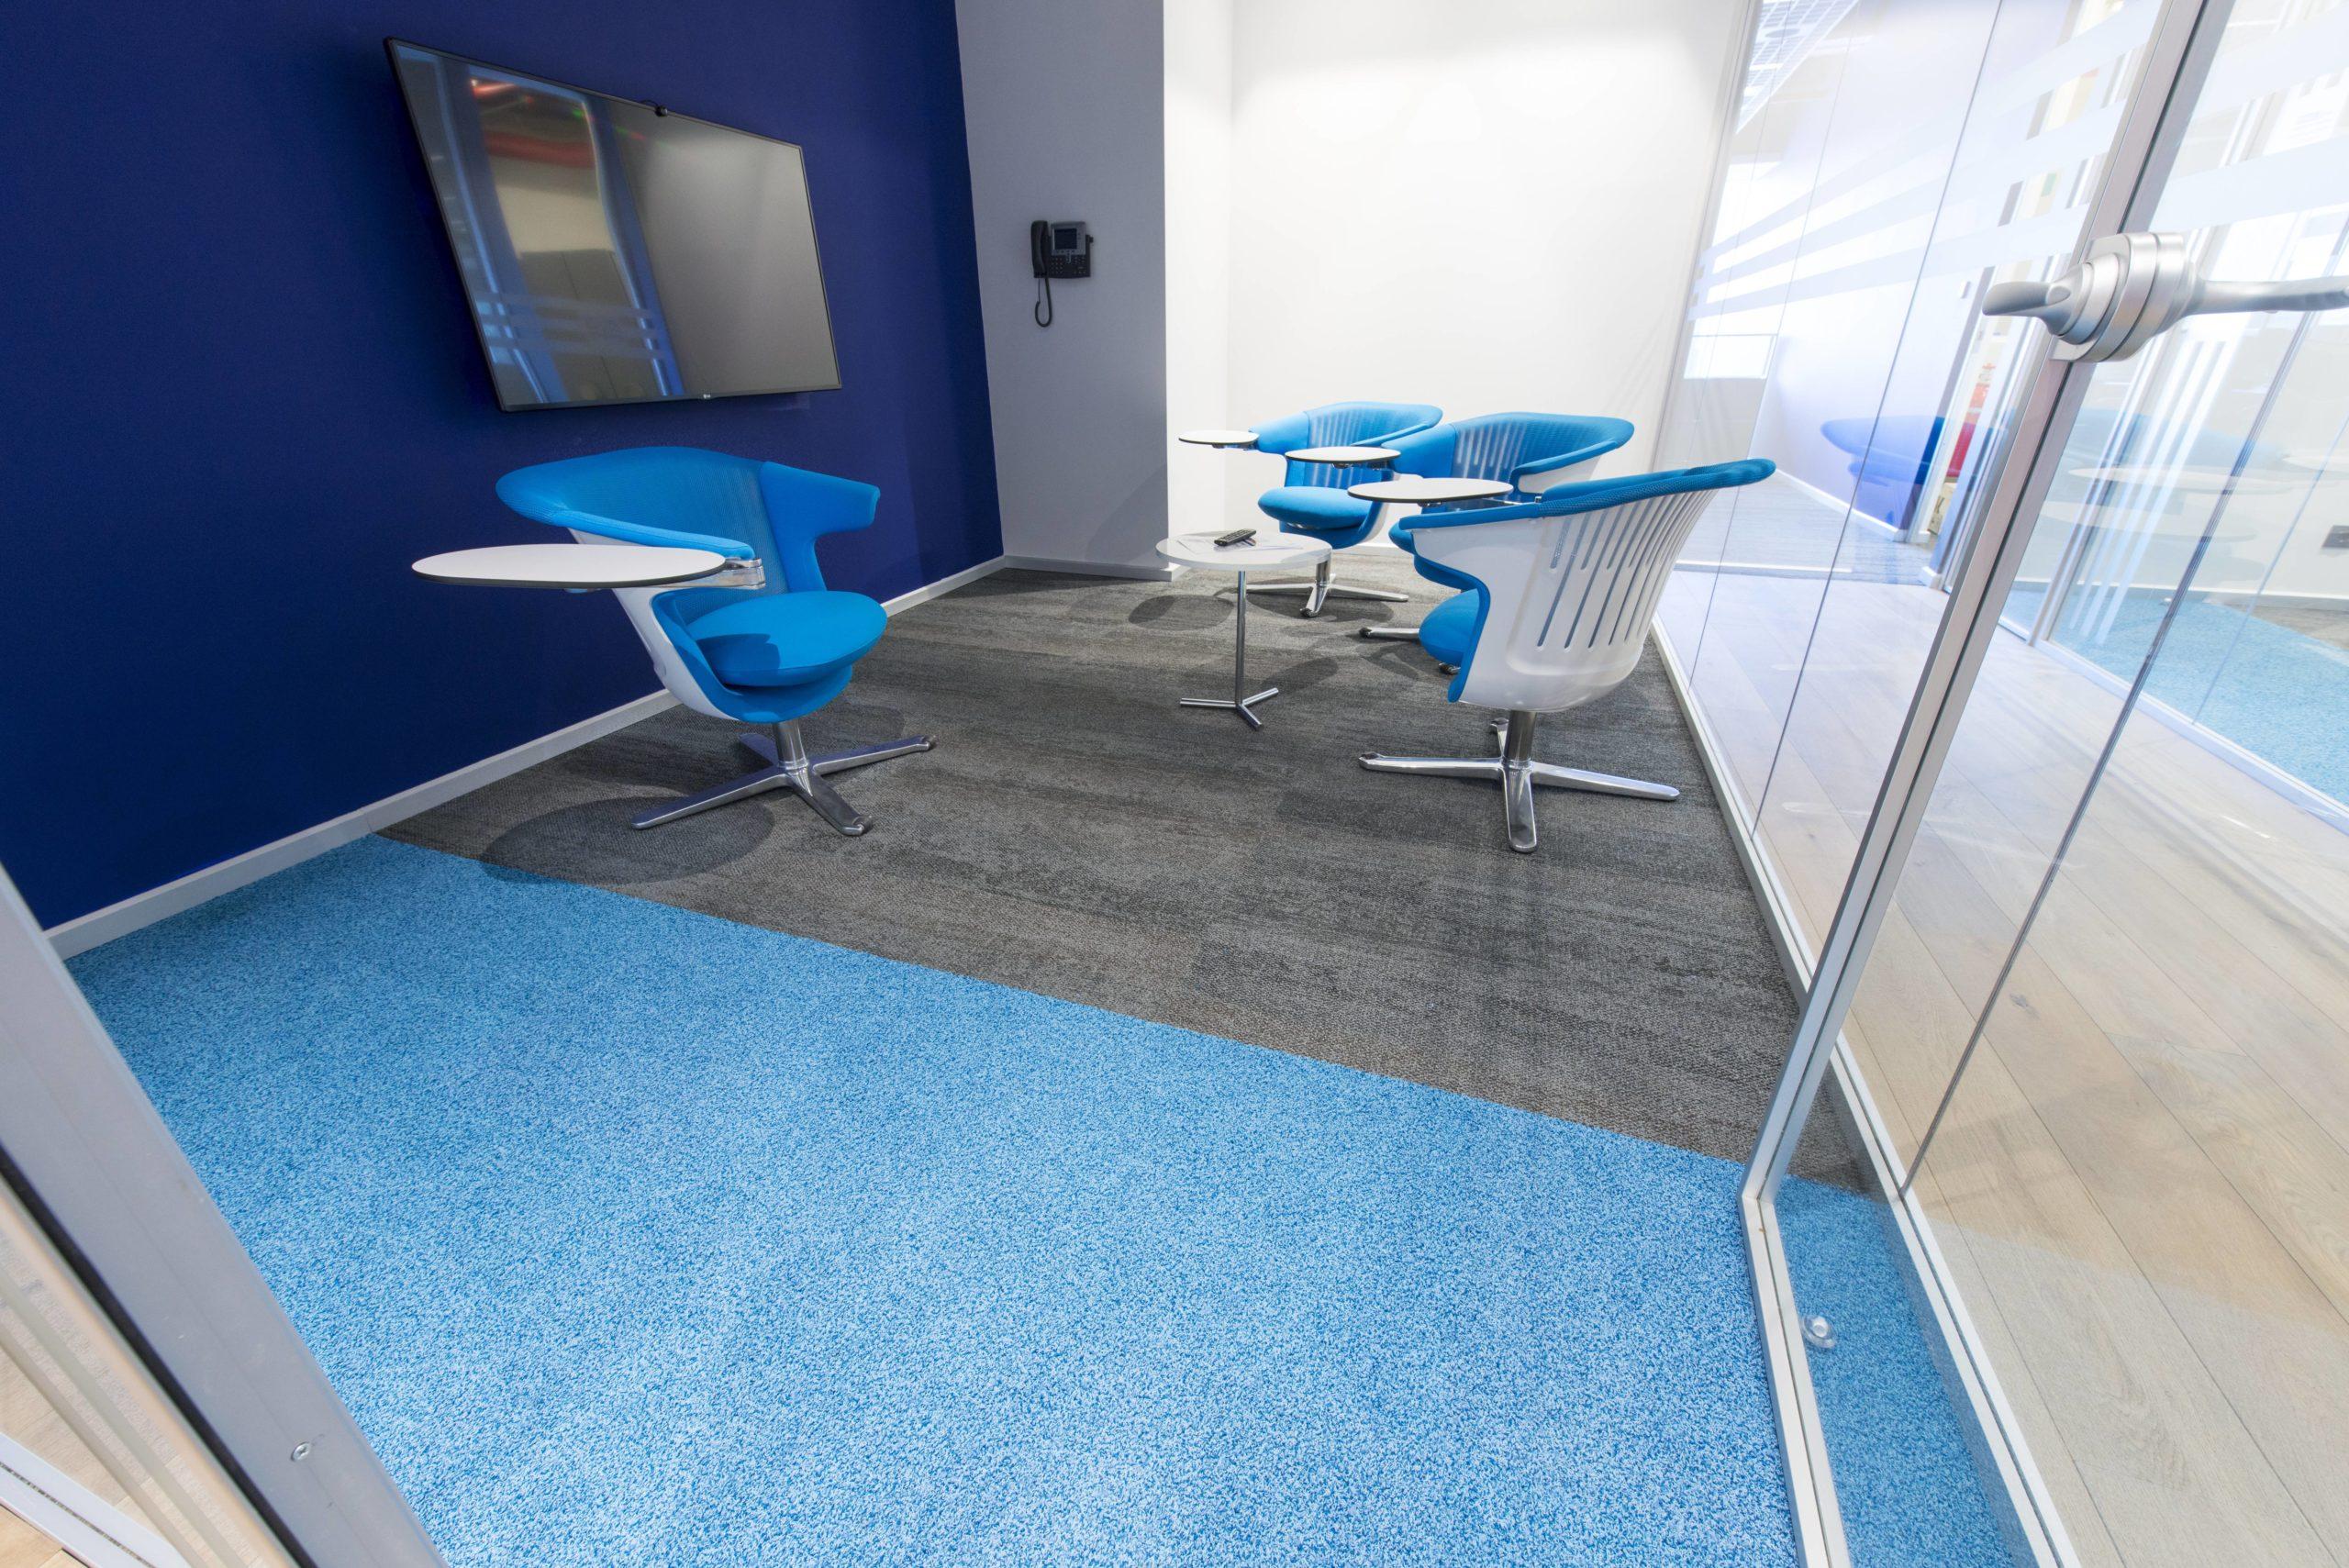 Poliüretan Zemin Kaplama - mavi ve gri poliuretan ofis zemin kaplama scaled